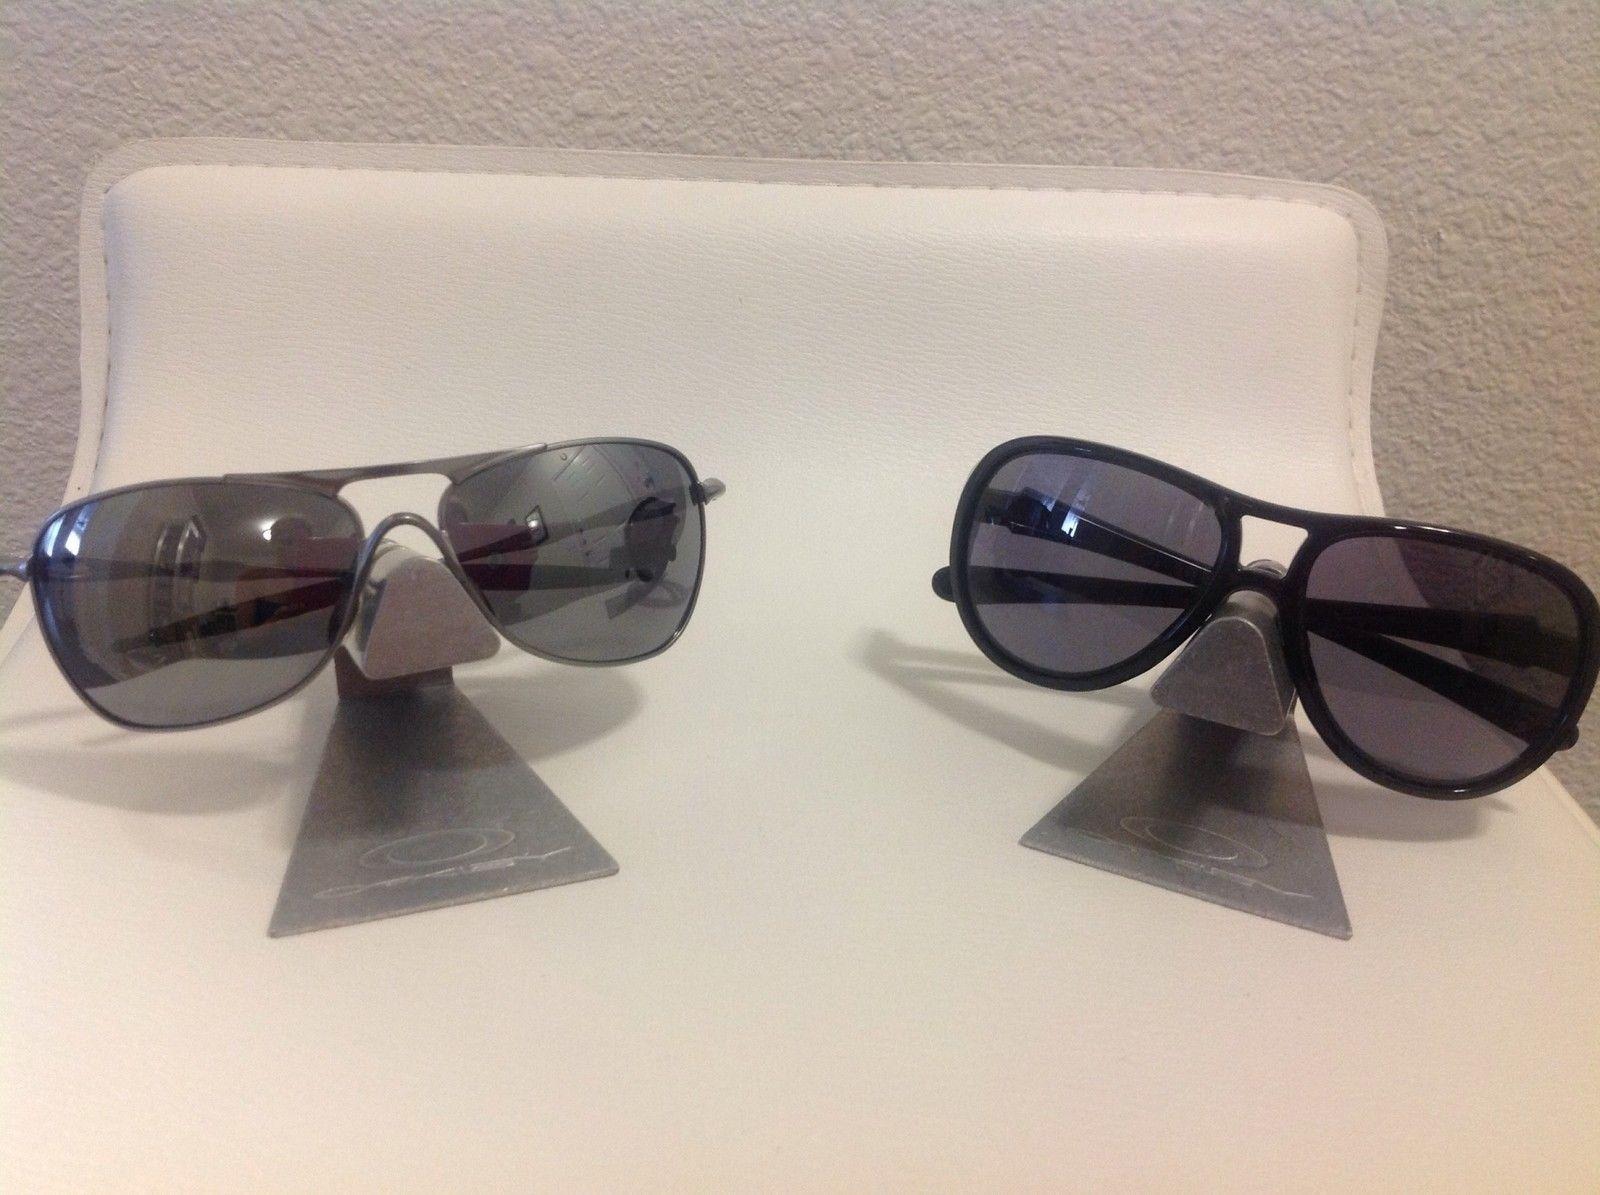 ??? What Oakleys Are These? - $T2eC16dHJIIE9qTYLiHrBR)L6yQ-+!~~60_57.JPG